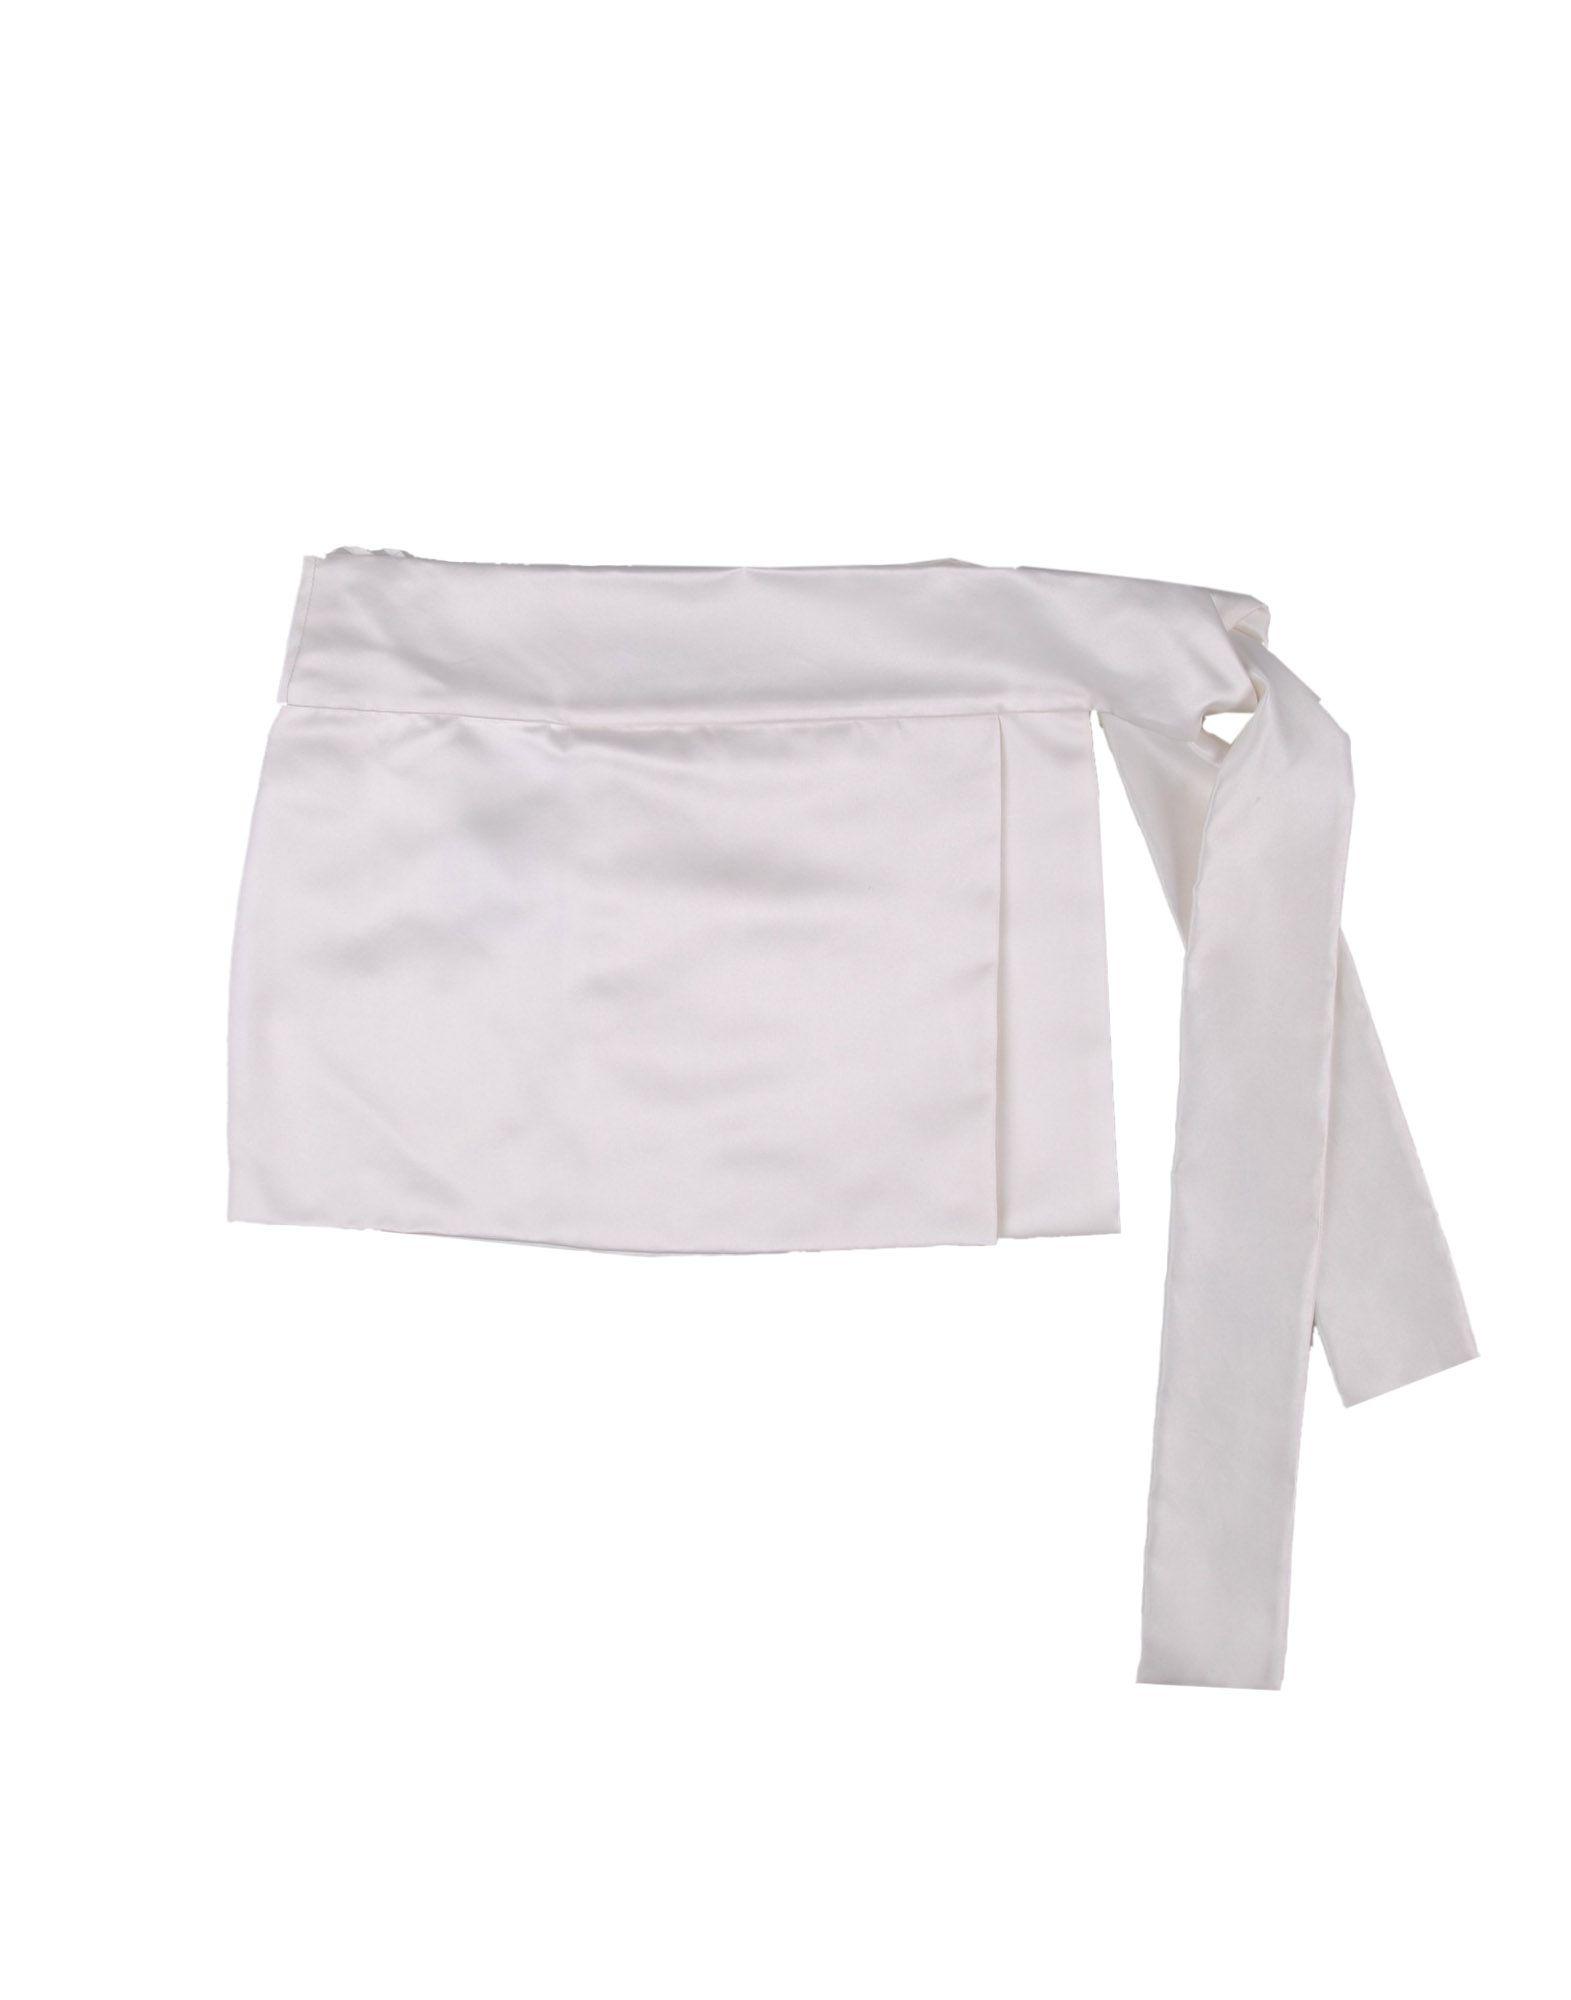 Prada Belt in White | Lyst